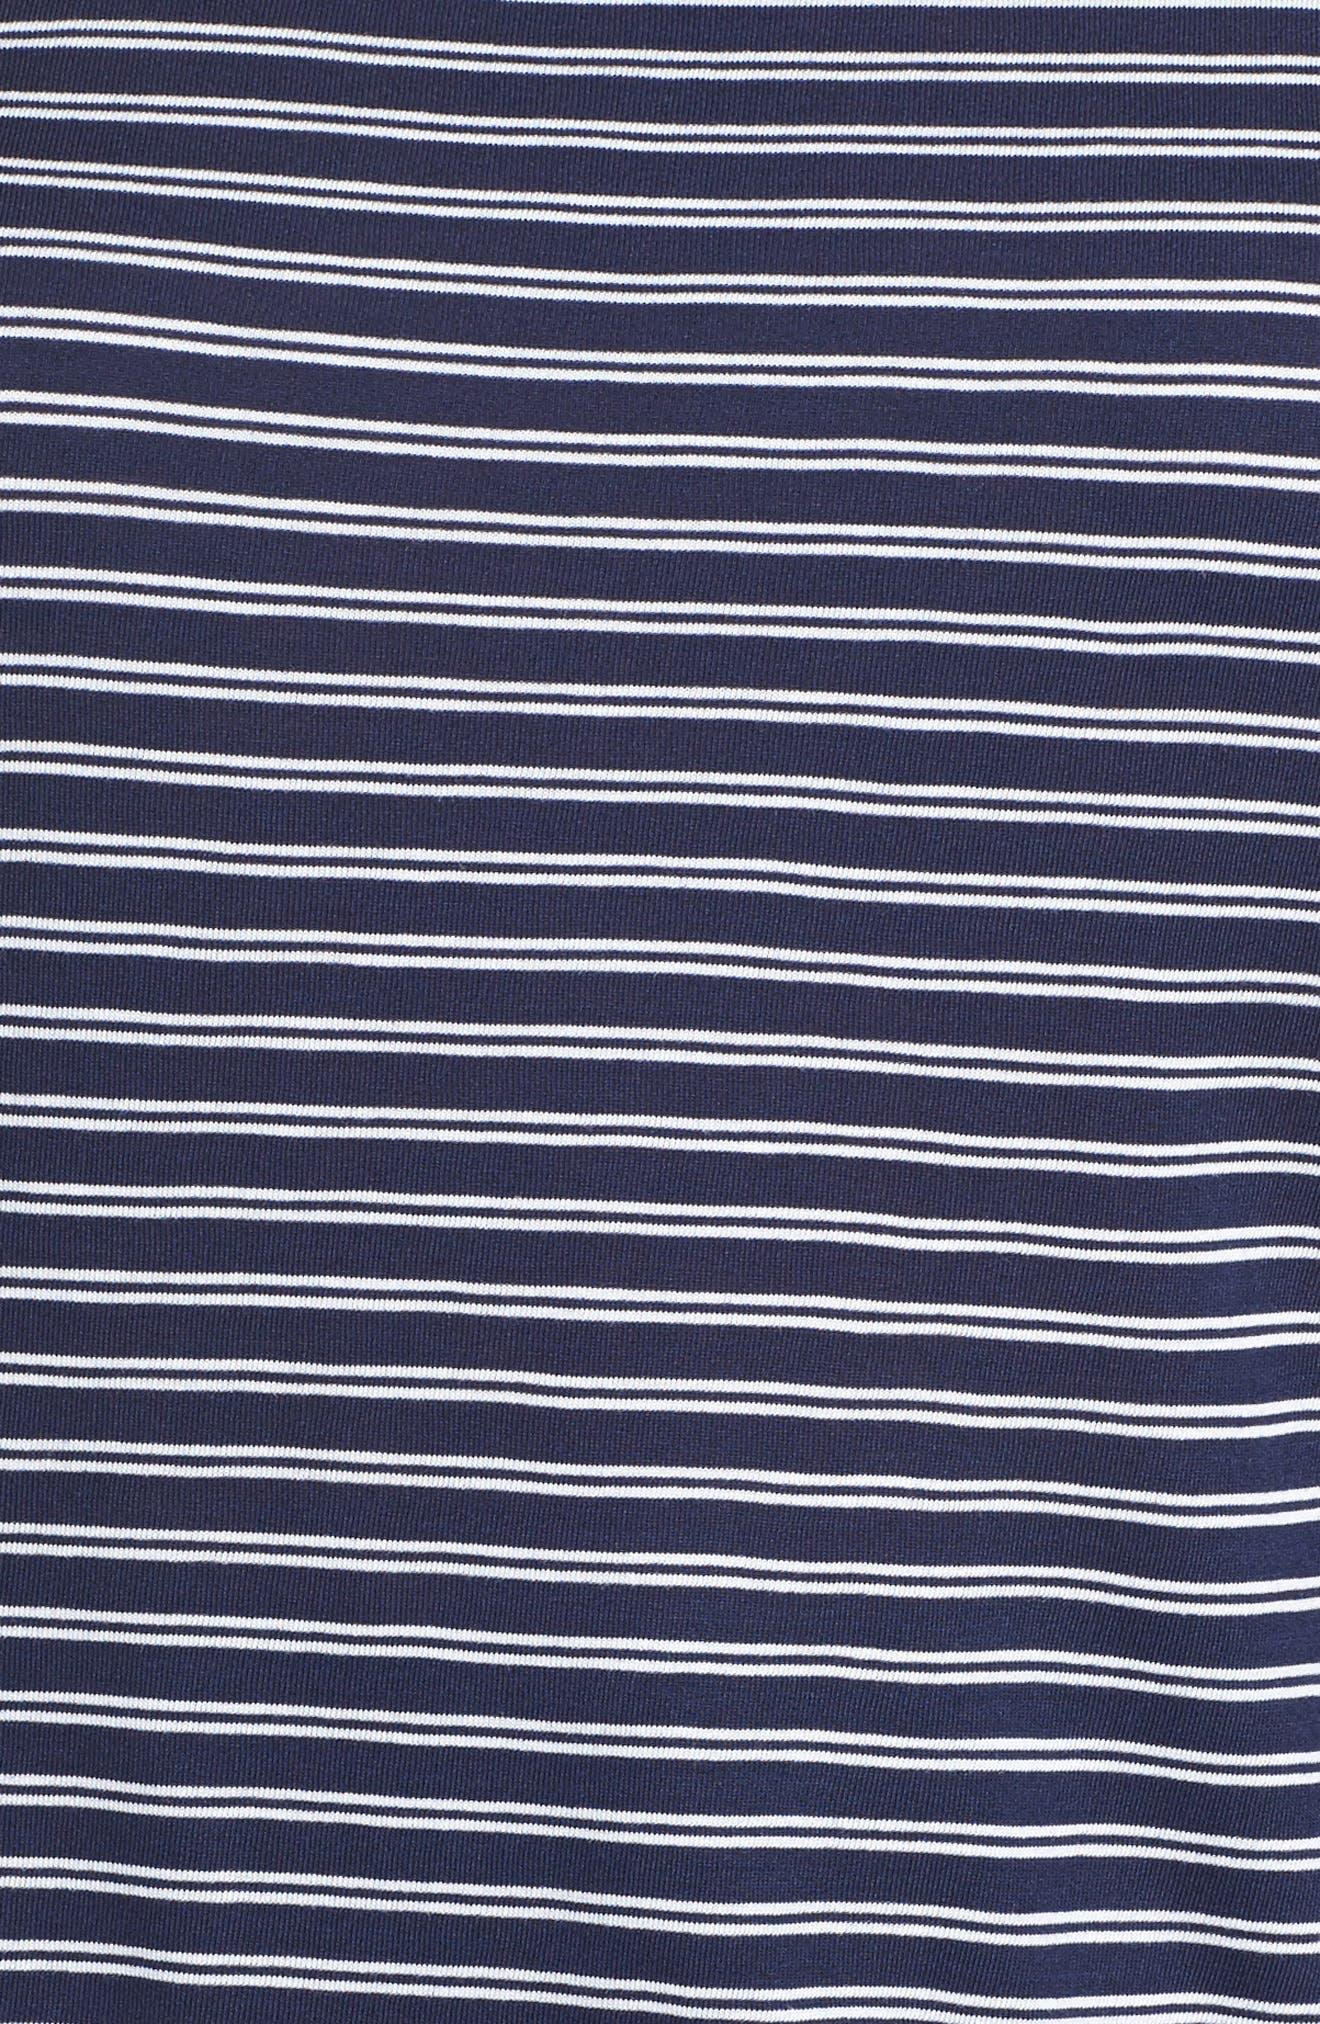 Stripe Cross Back Tee,                             Alternate thumbnail 5, color,                             410